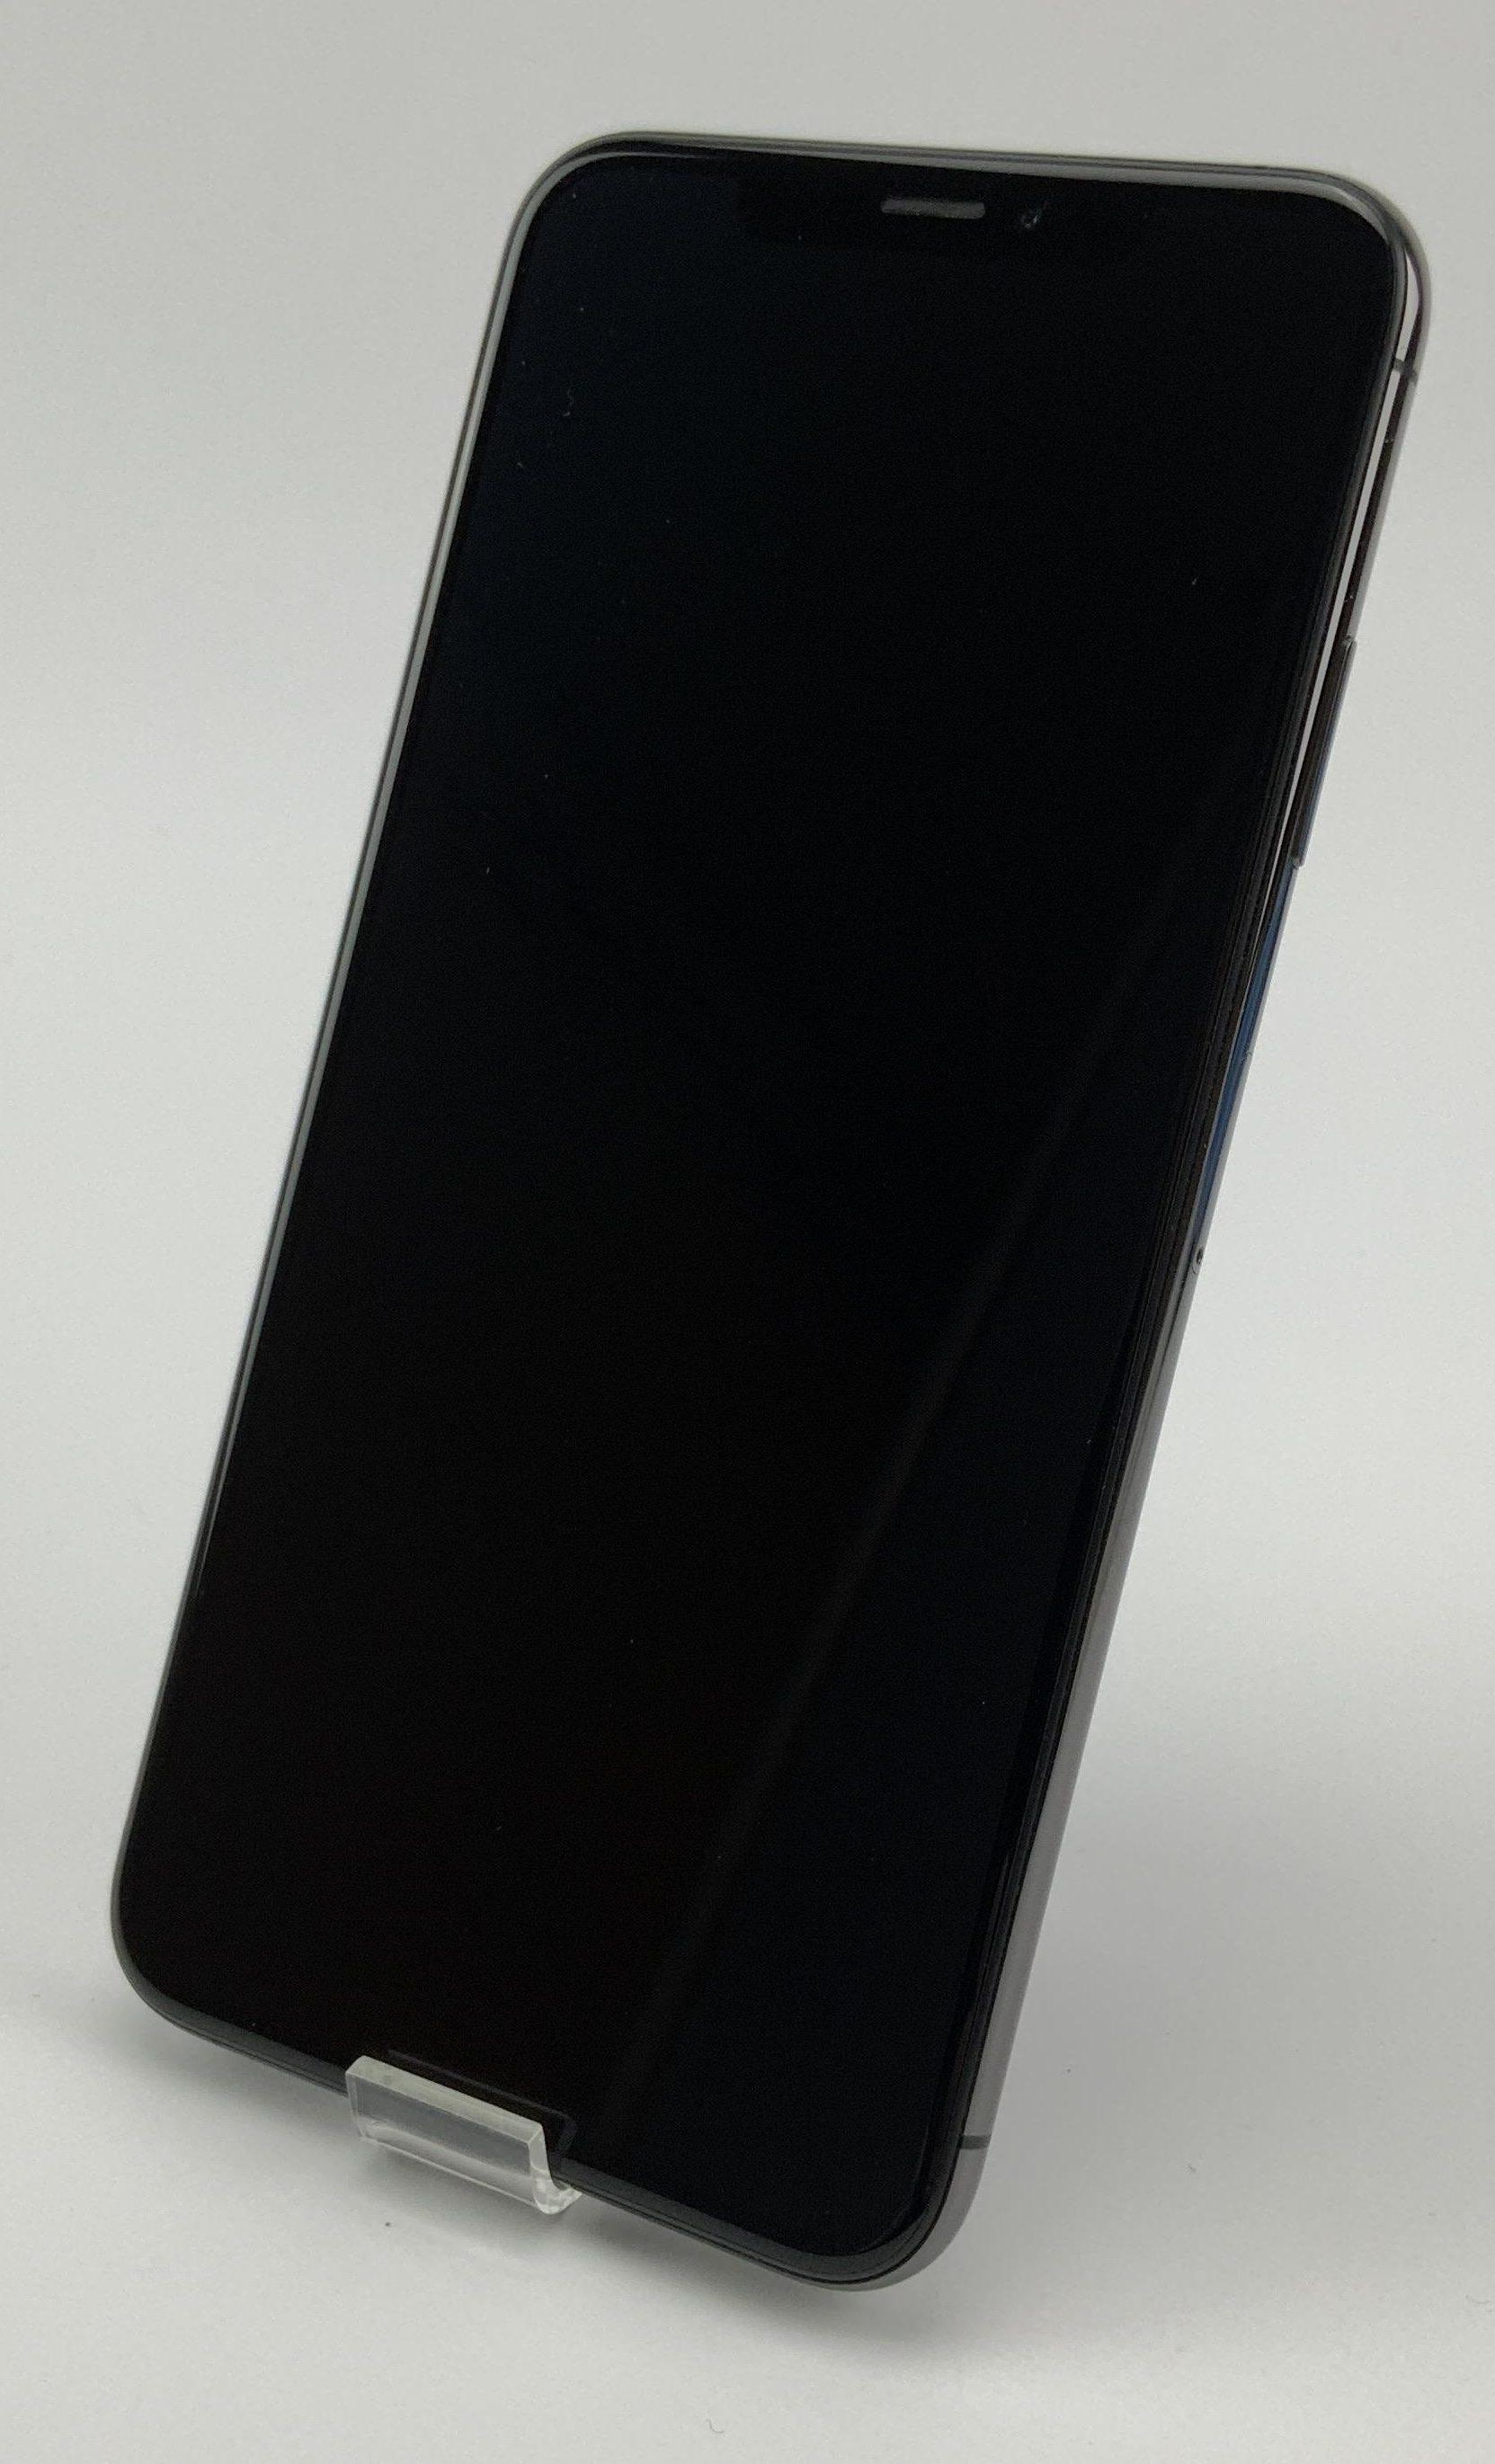 iPhone XS Max 512GB, 512GB, Space Gray, imagen 1